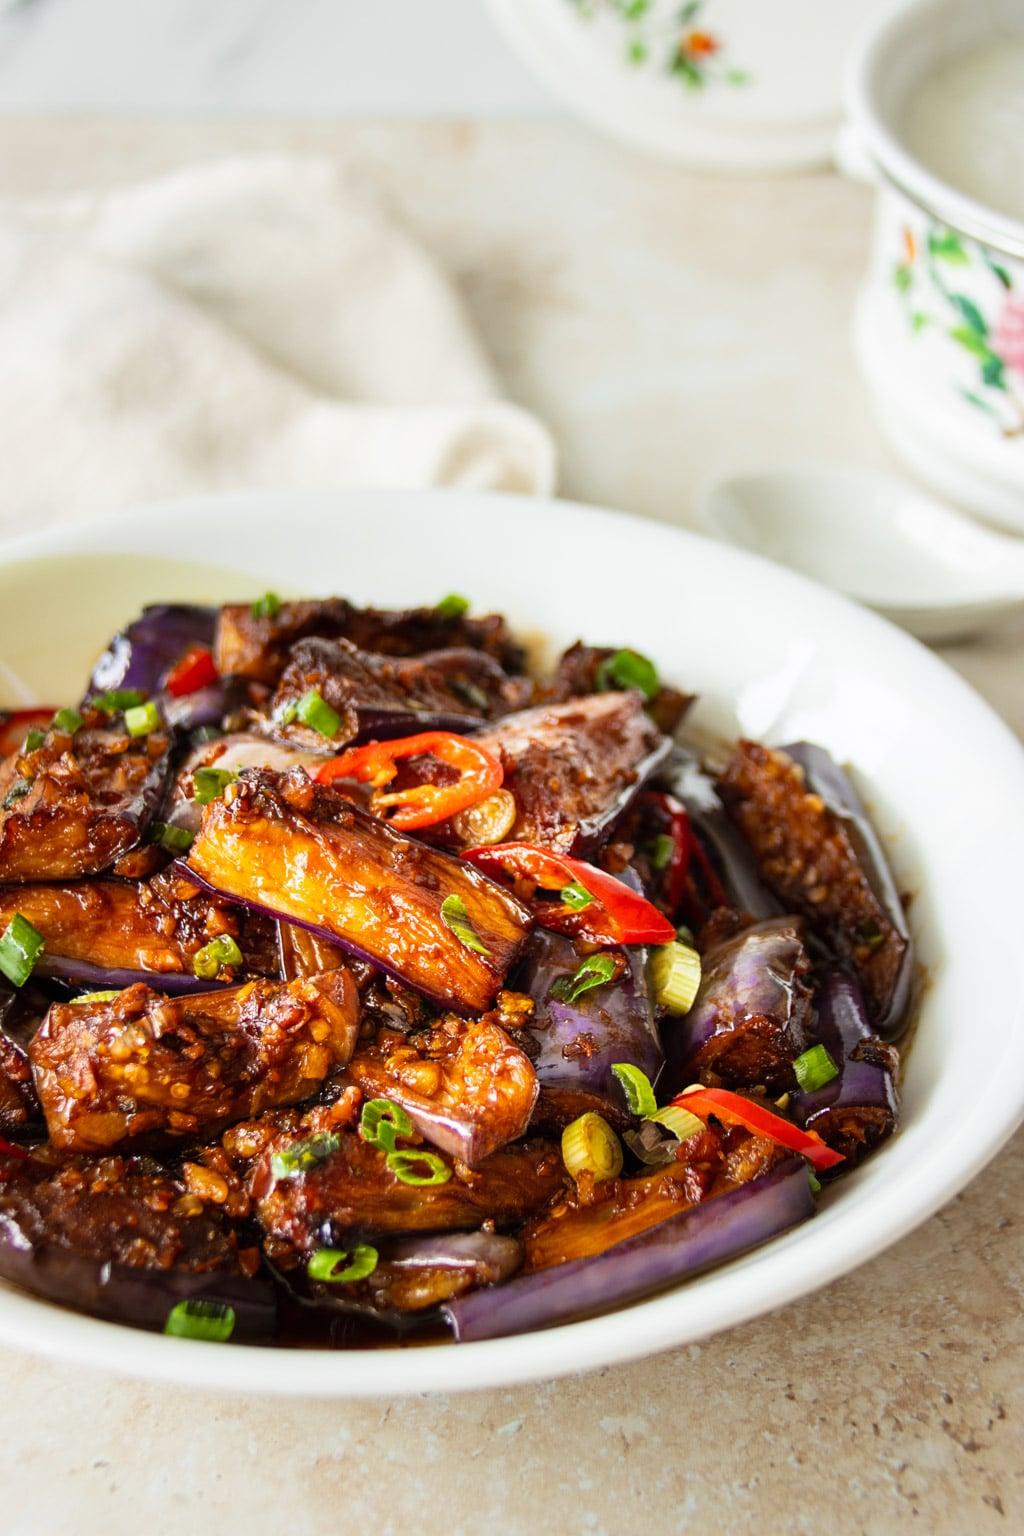 Stir-fried Brinjal with Garlic & Dried Shrimp